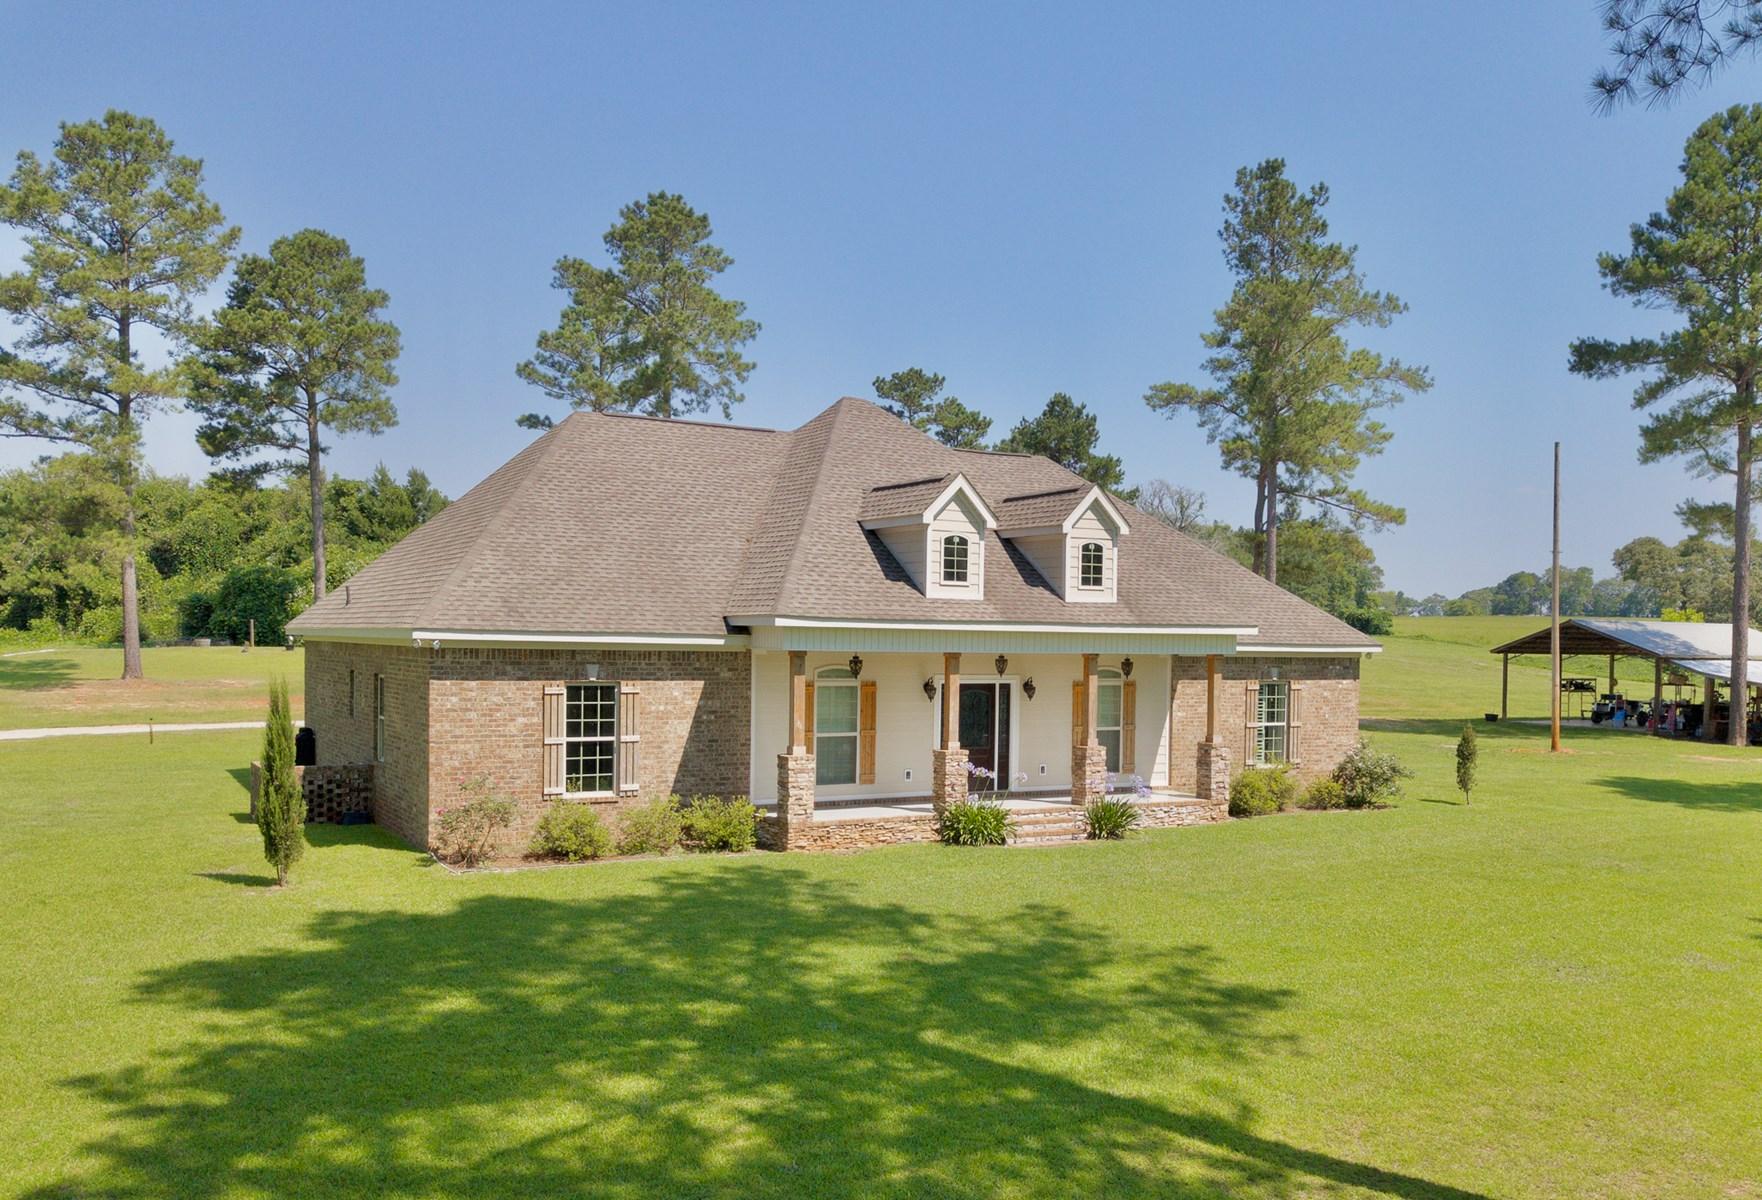 4 BR Home w/ Land & Pole Barn for Sale in Enterprise, AL